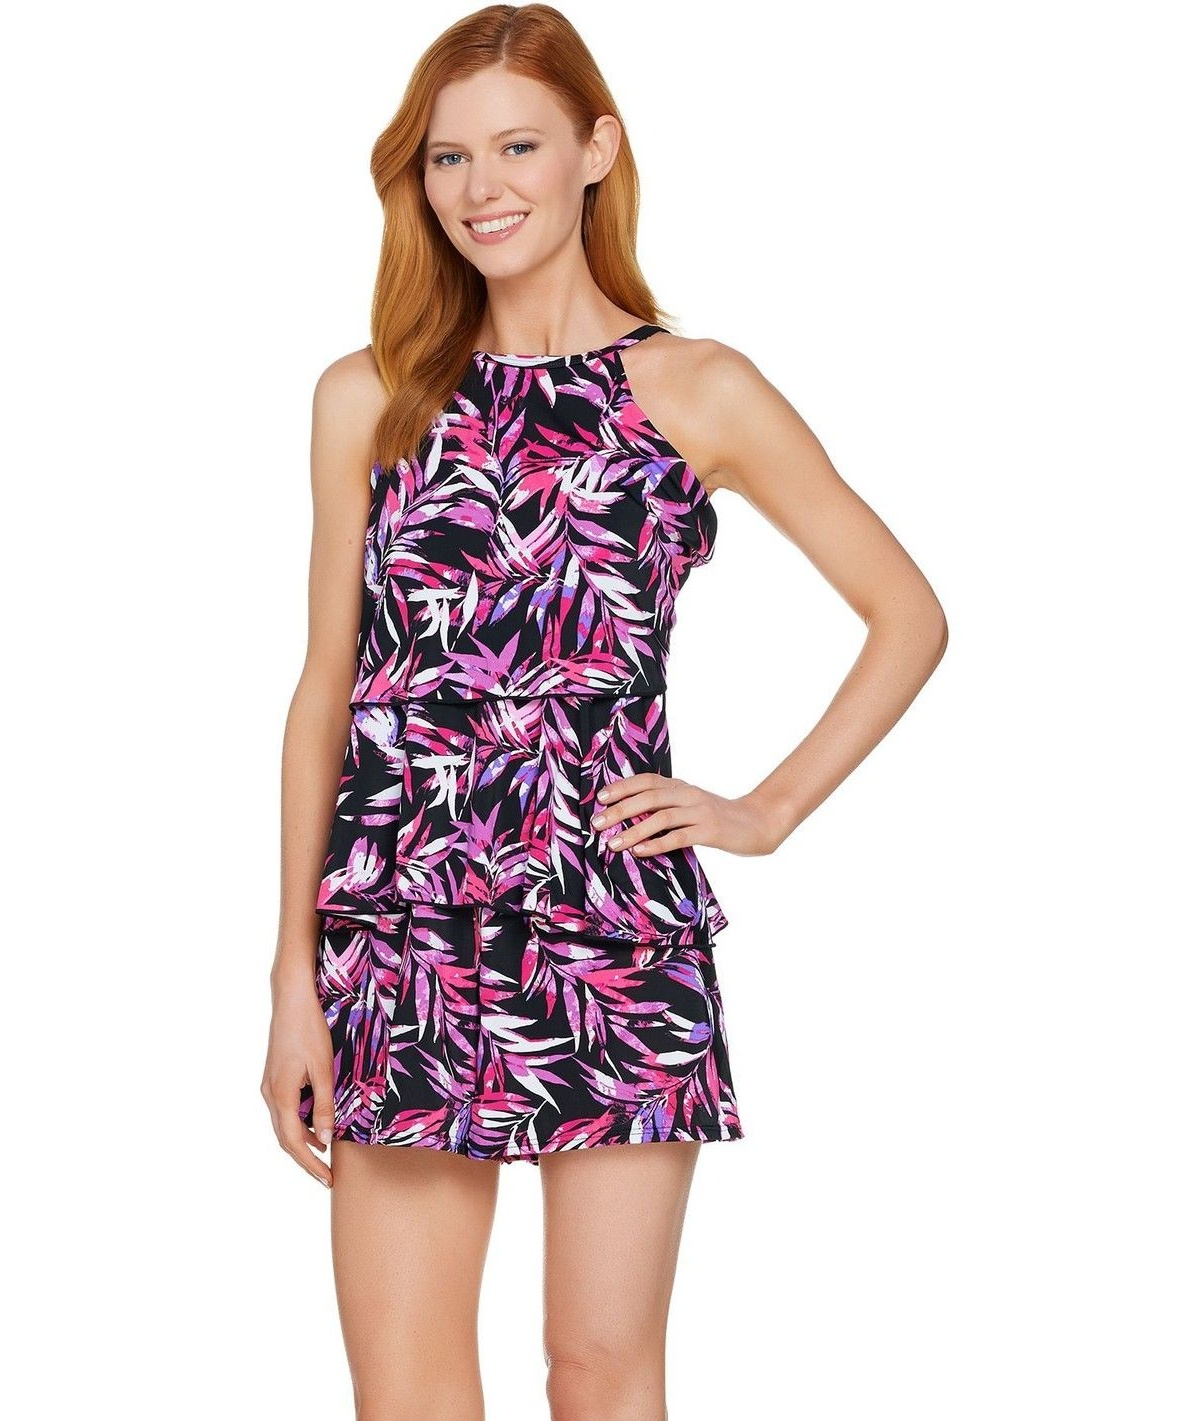 802e1d500295 Fit 4 U - Fit 4 U Hi Neck Double Tiered Romper Swimsuit A288587 -  Walmart.com